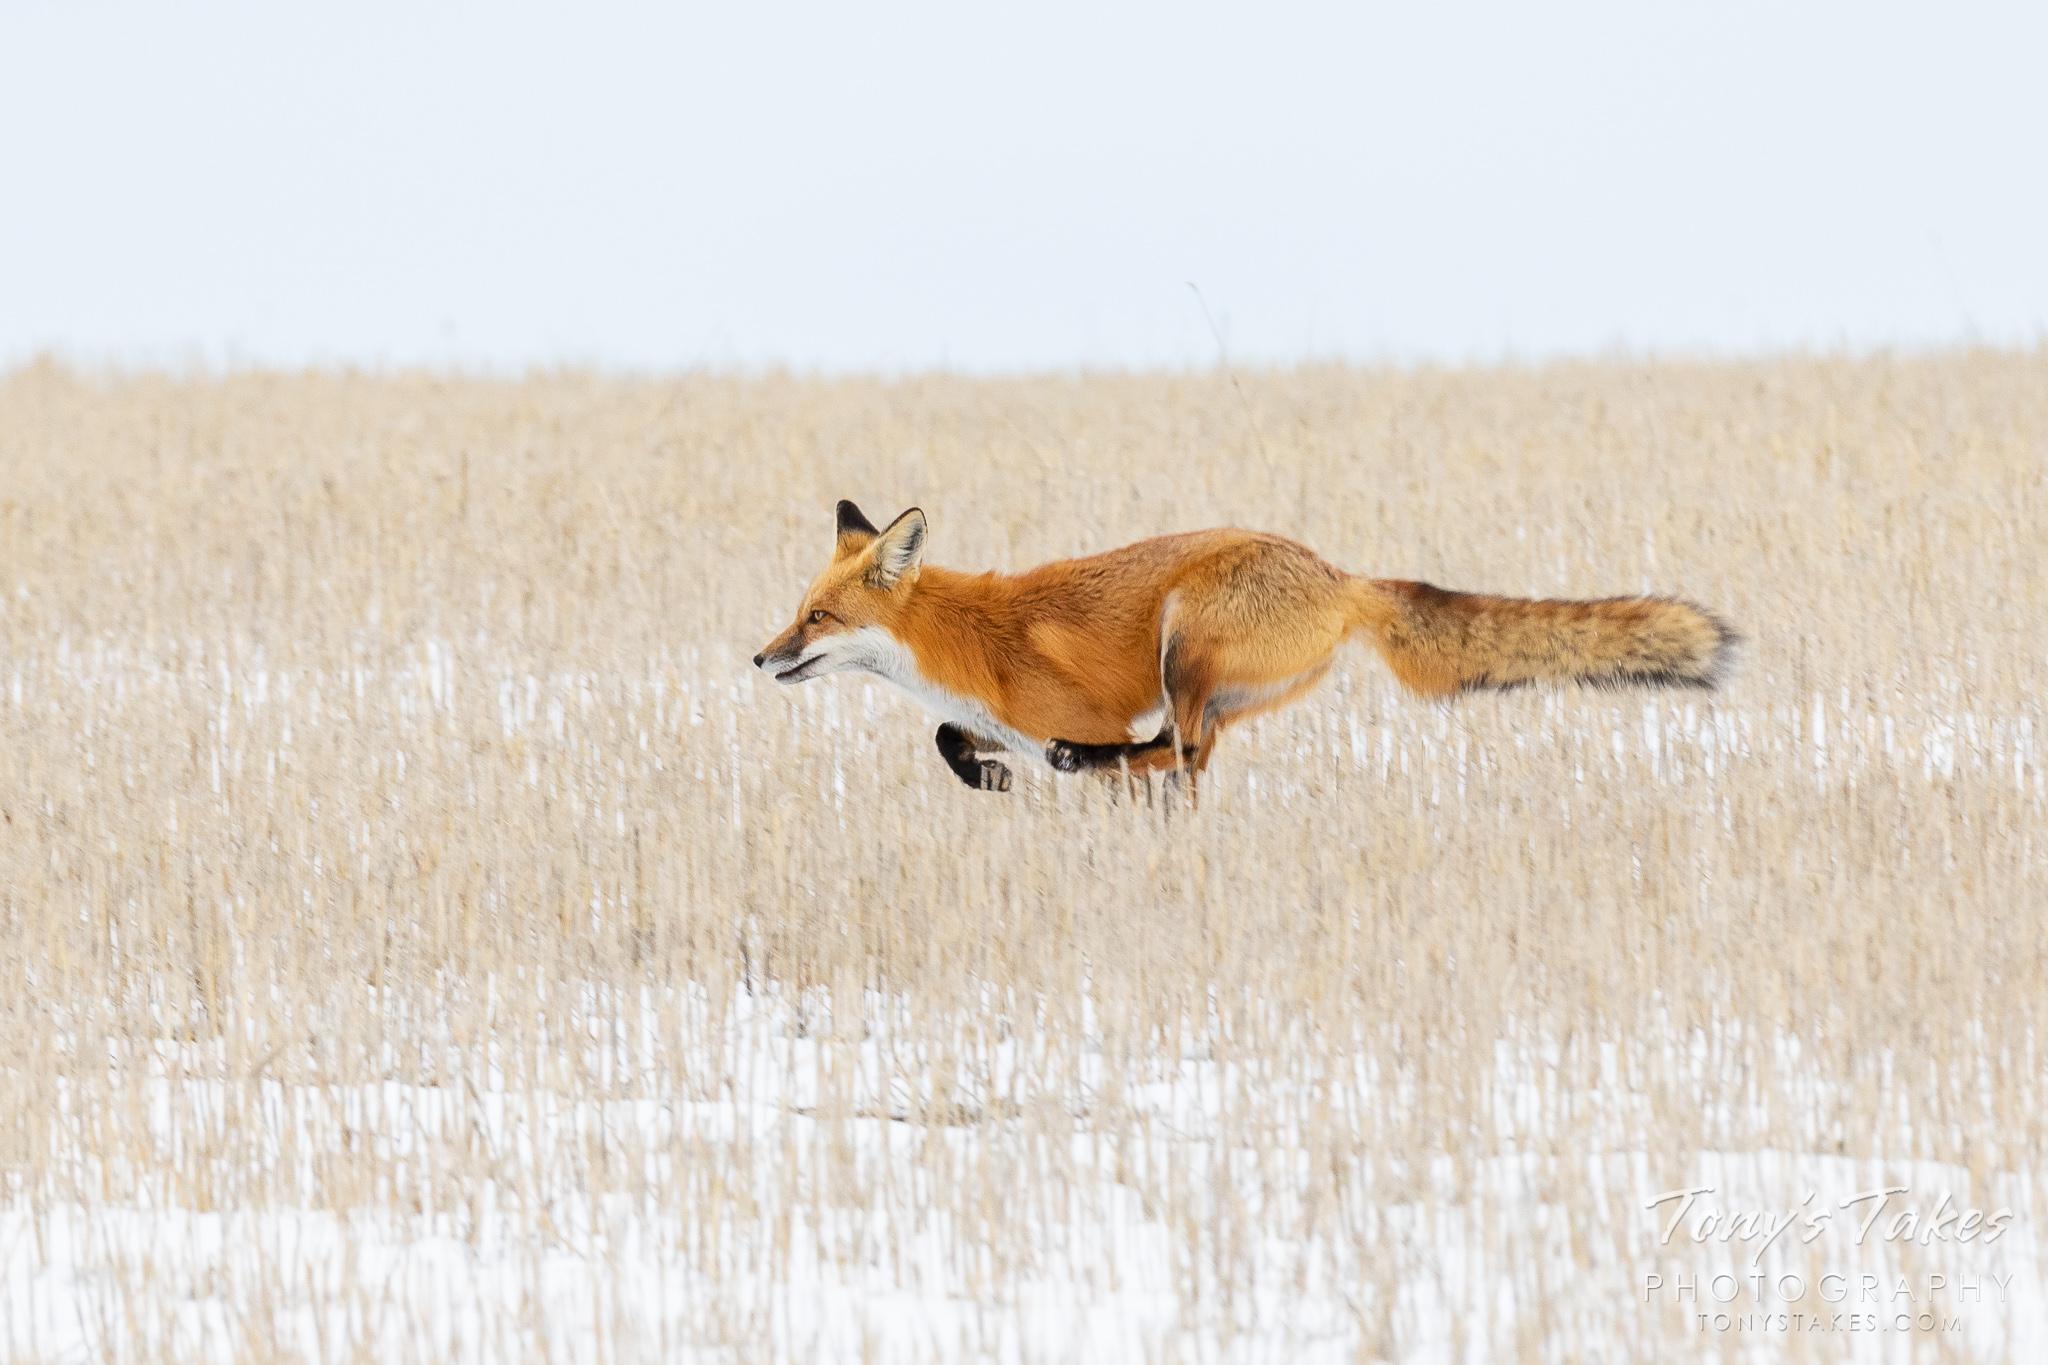 A red fox runs through a field in rural Adams County, Colorado. (© Tony's Takes)